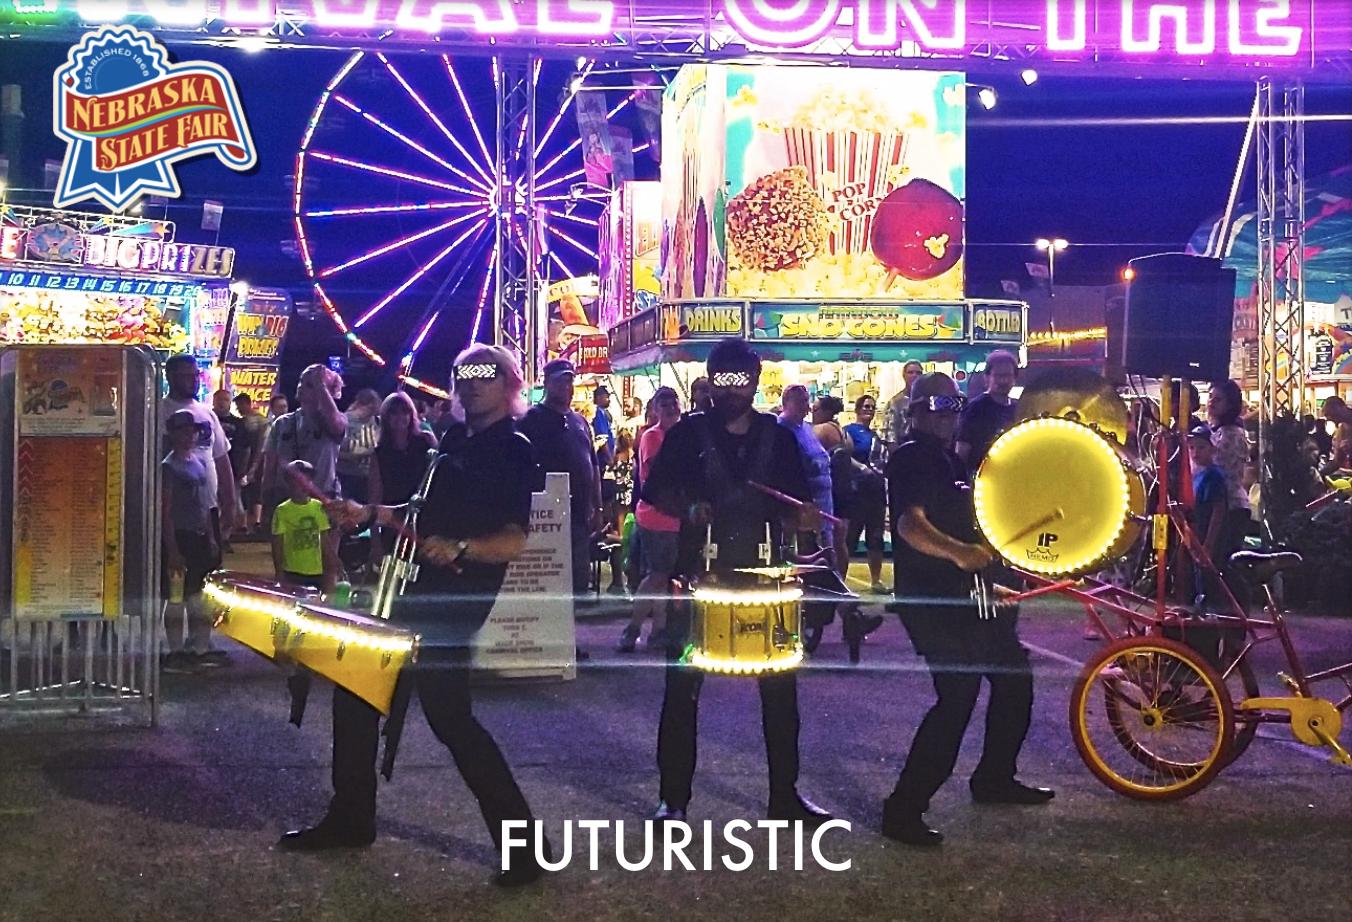 Fair Futuristic